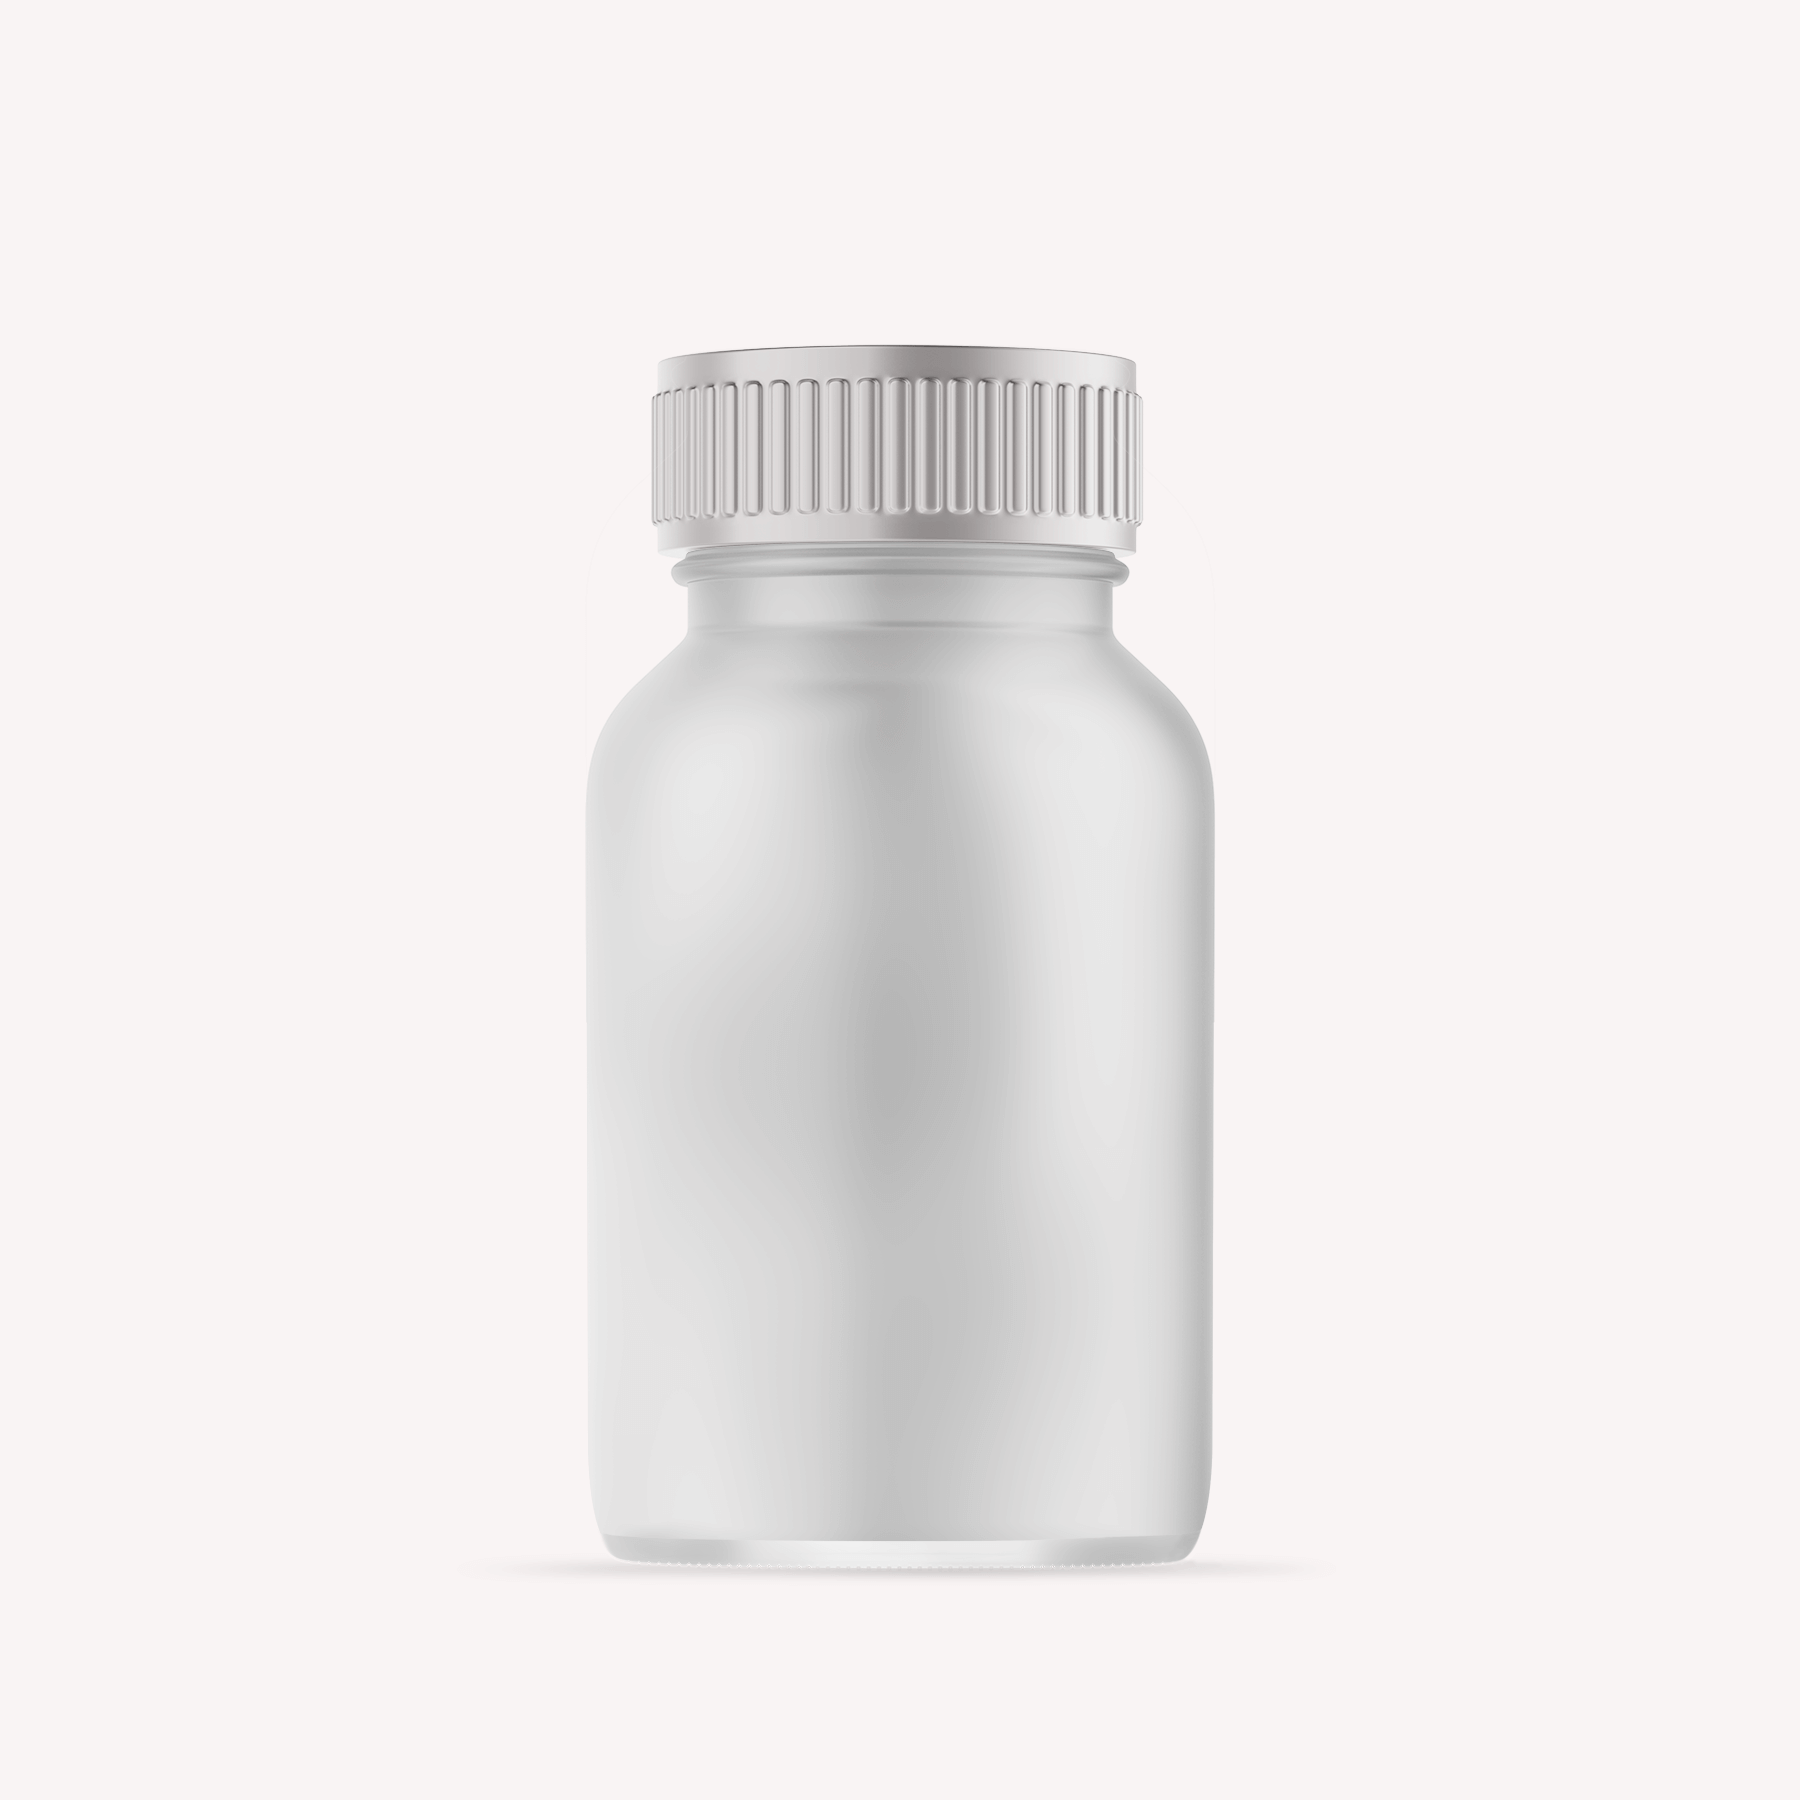 Free Plastic Pills Bottle Mockup